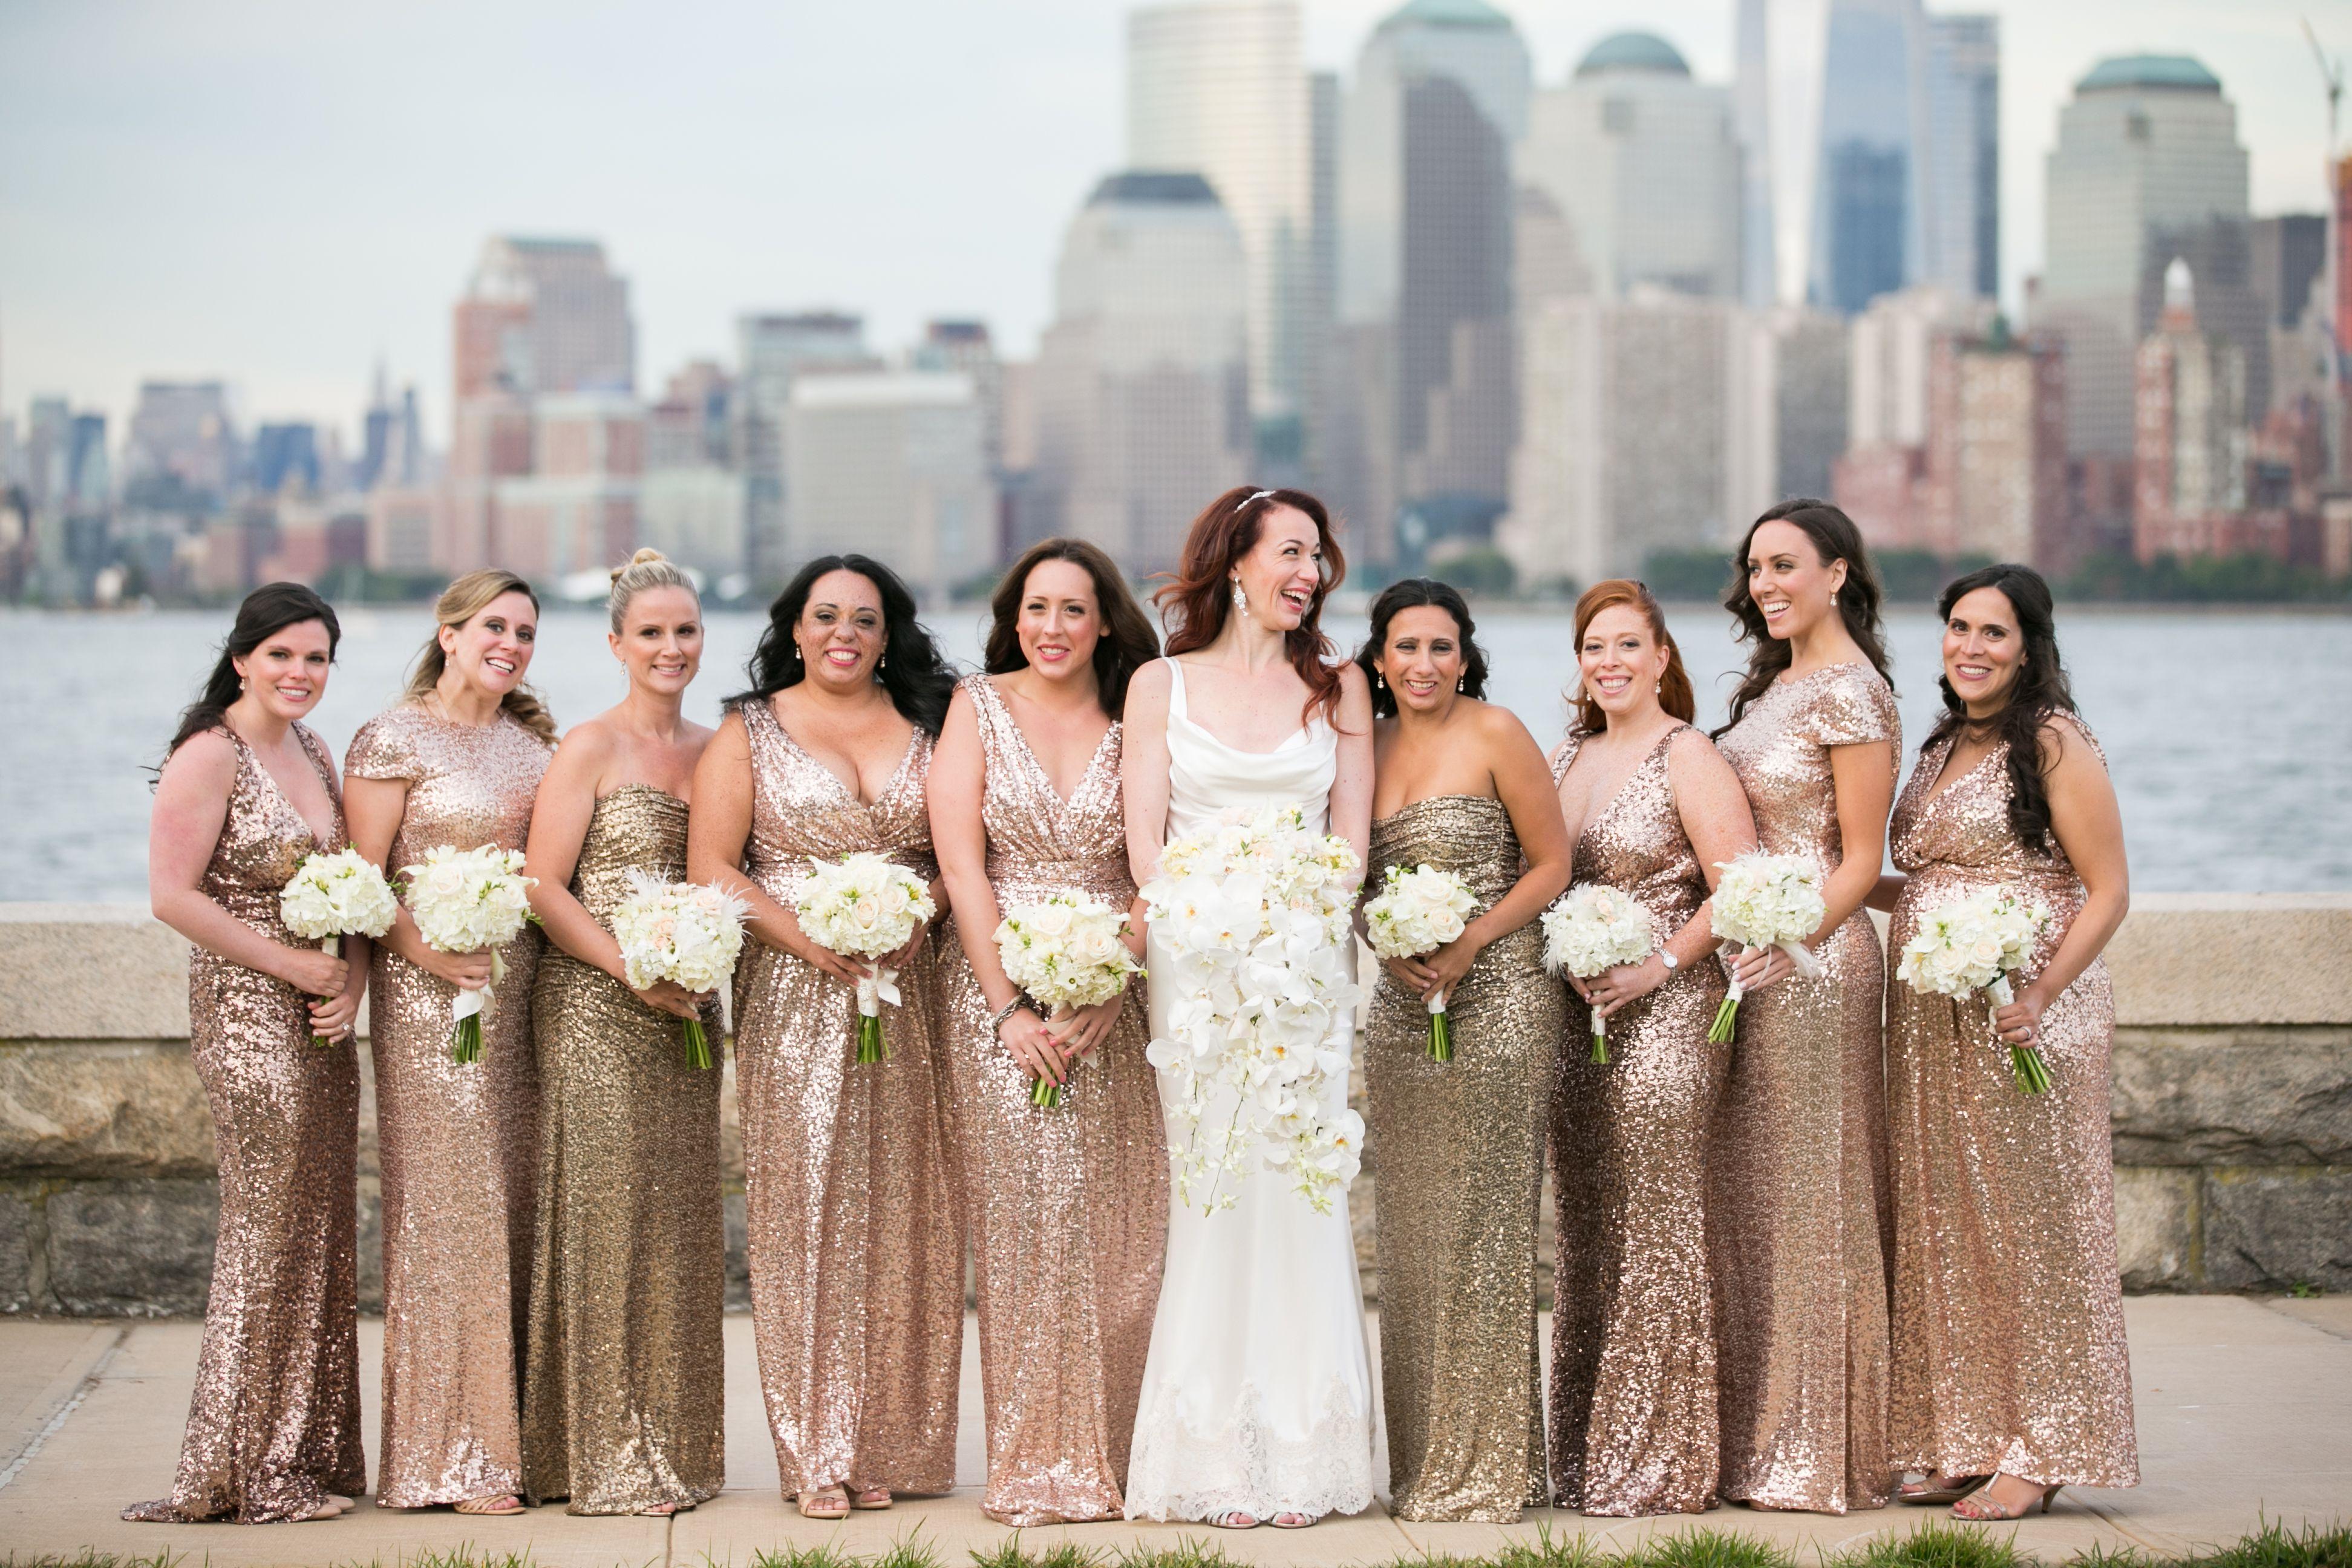 Gold sequin badgley mischka bridesmaid dresses cindys wedding gold sequin badgley mischka bridesmaid dresses ombrellifo Choice Image